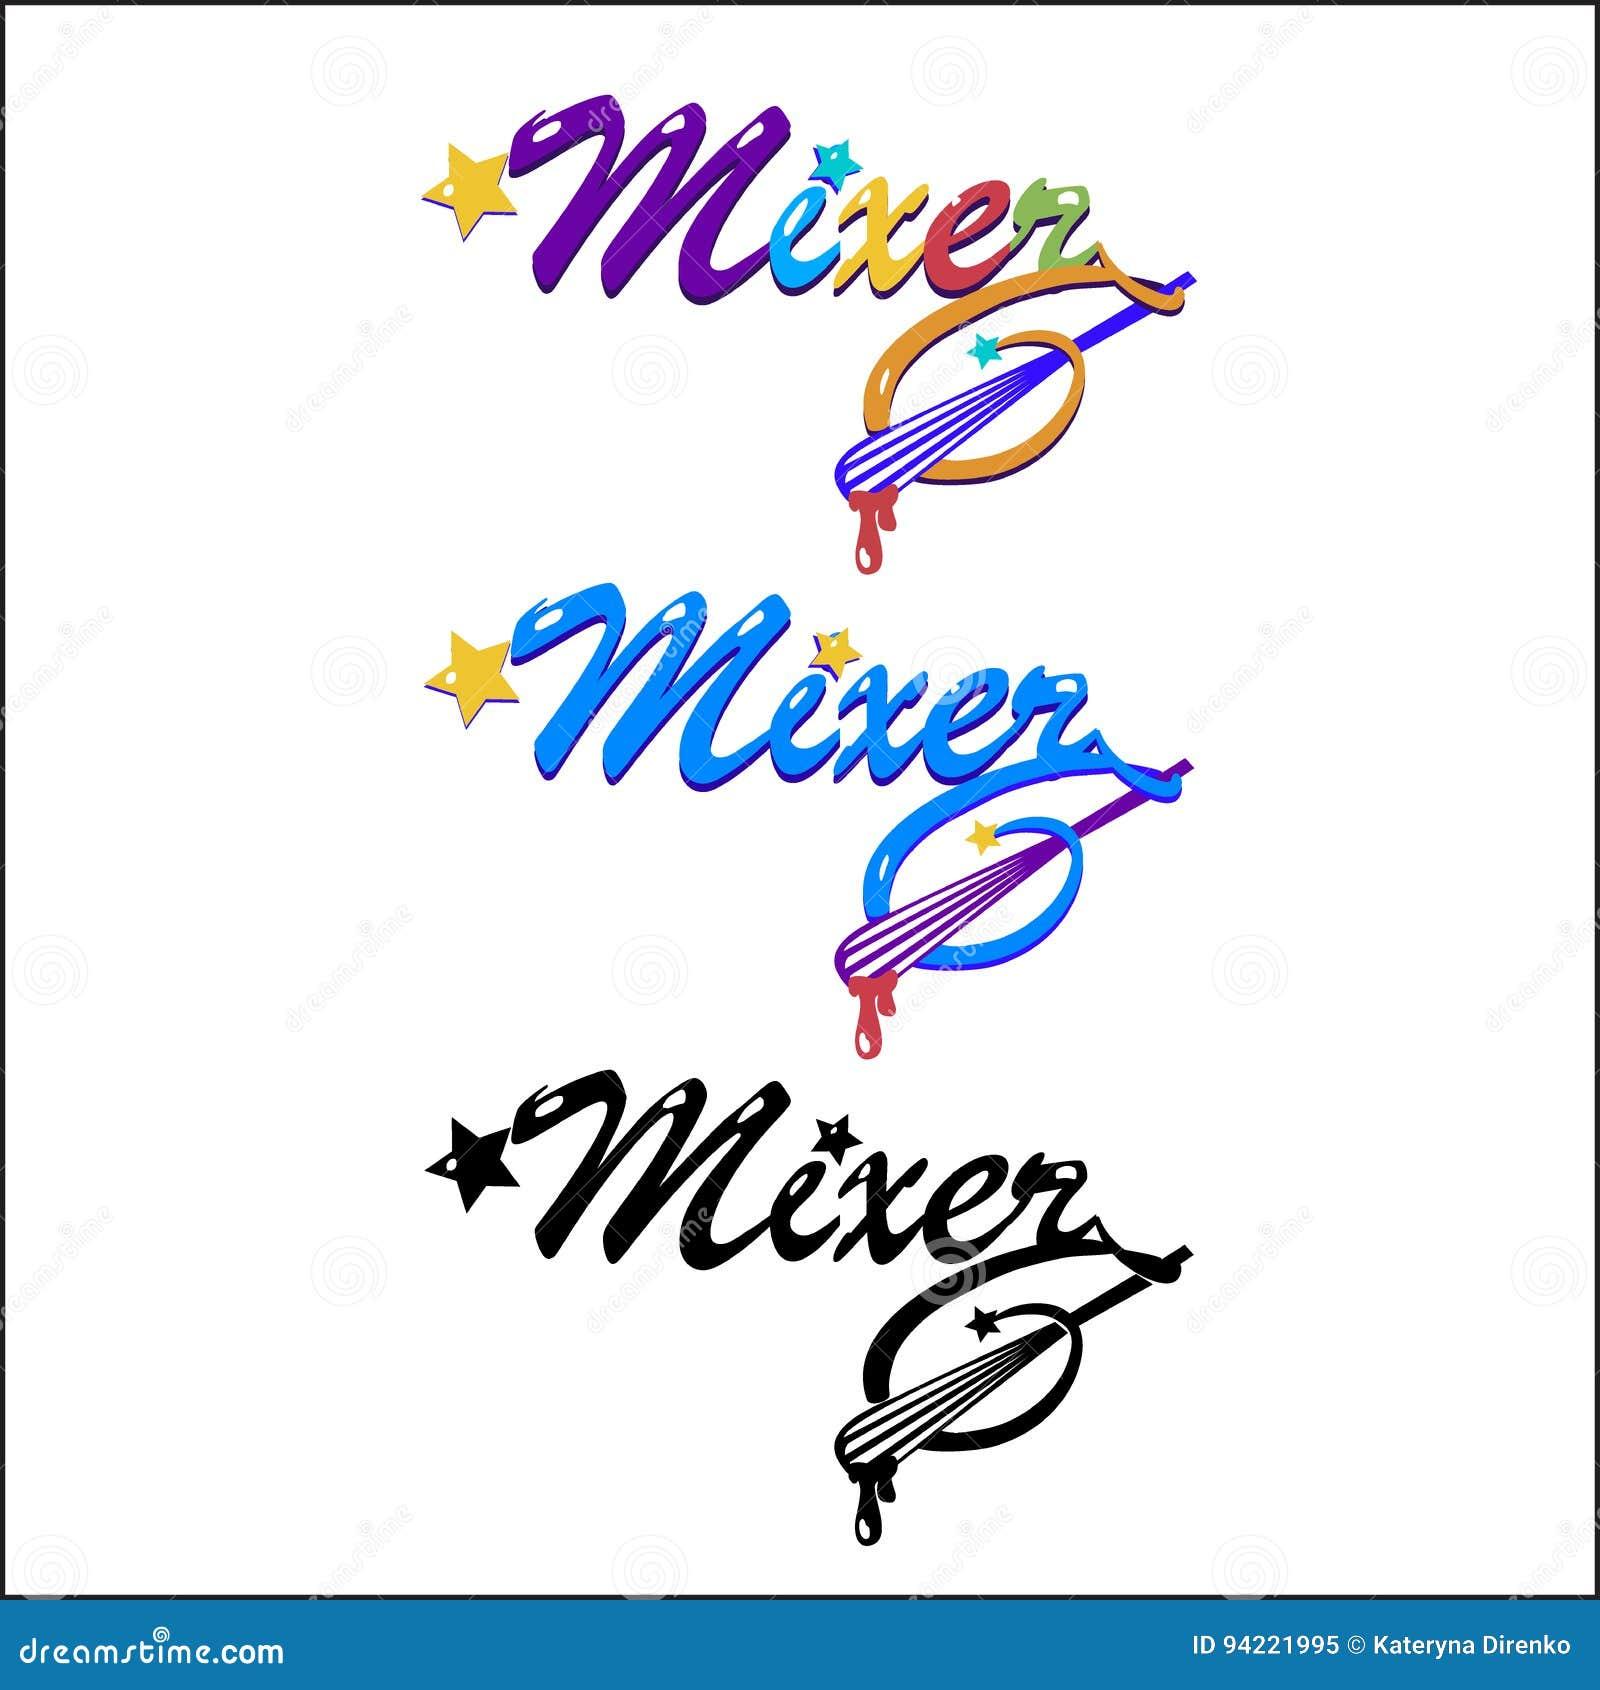 Mixer- 3 kinds of logos stock illustration  Illustration of